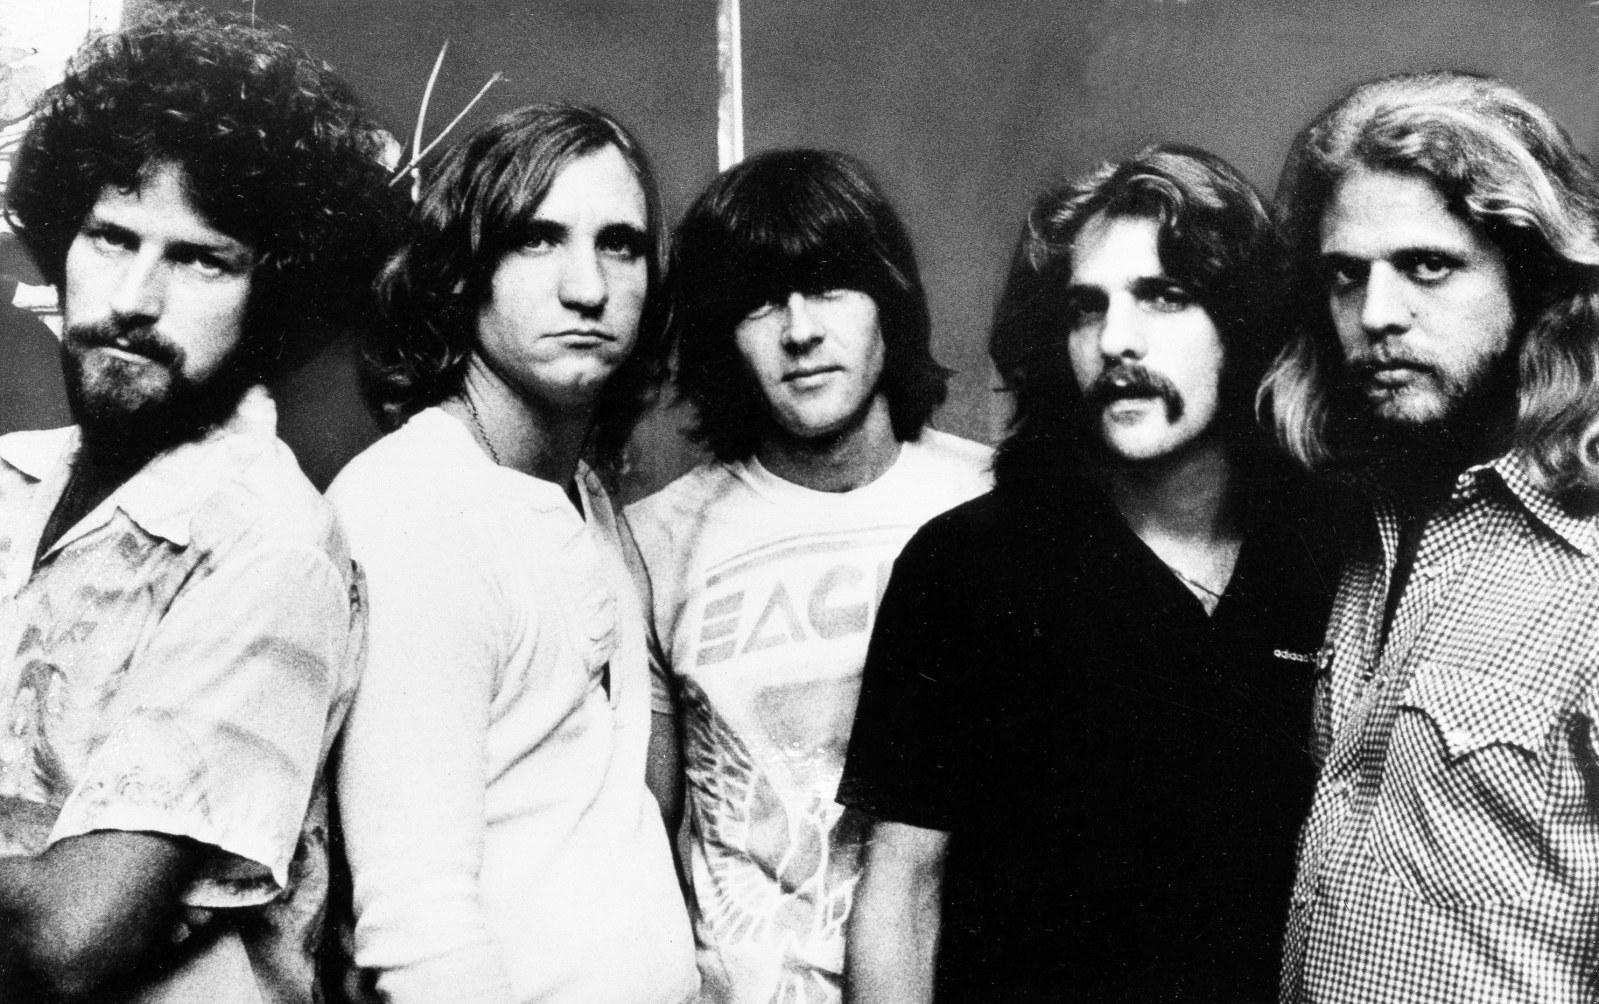 Išsiskyrė grupė Eagles